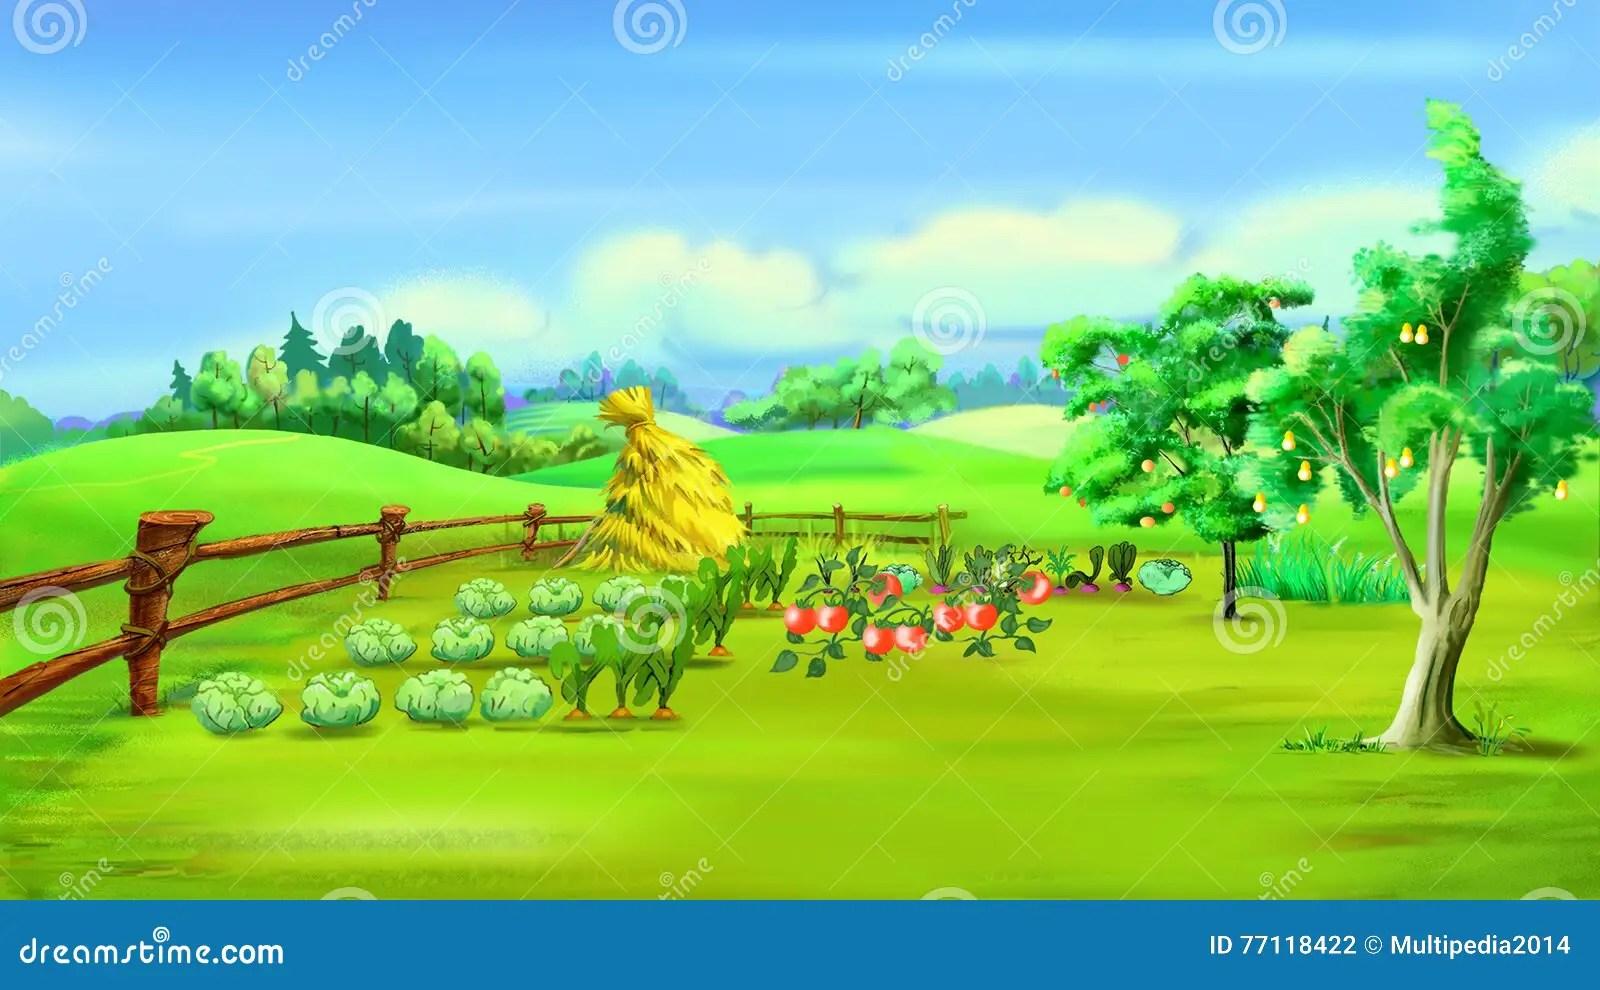 Vegetable Garden Layout Template